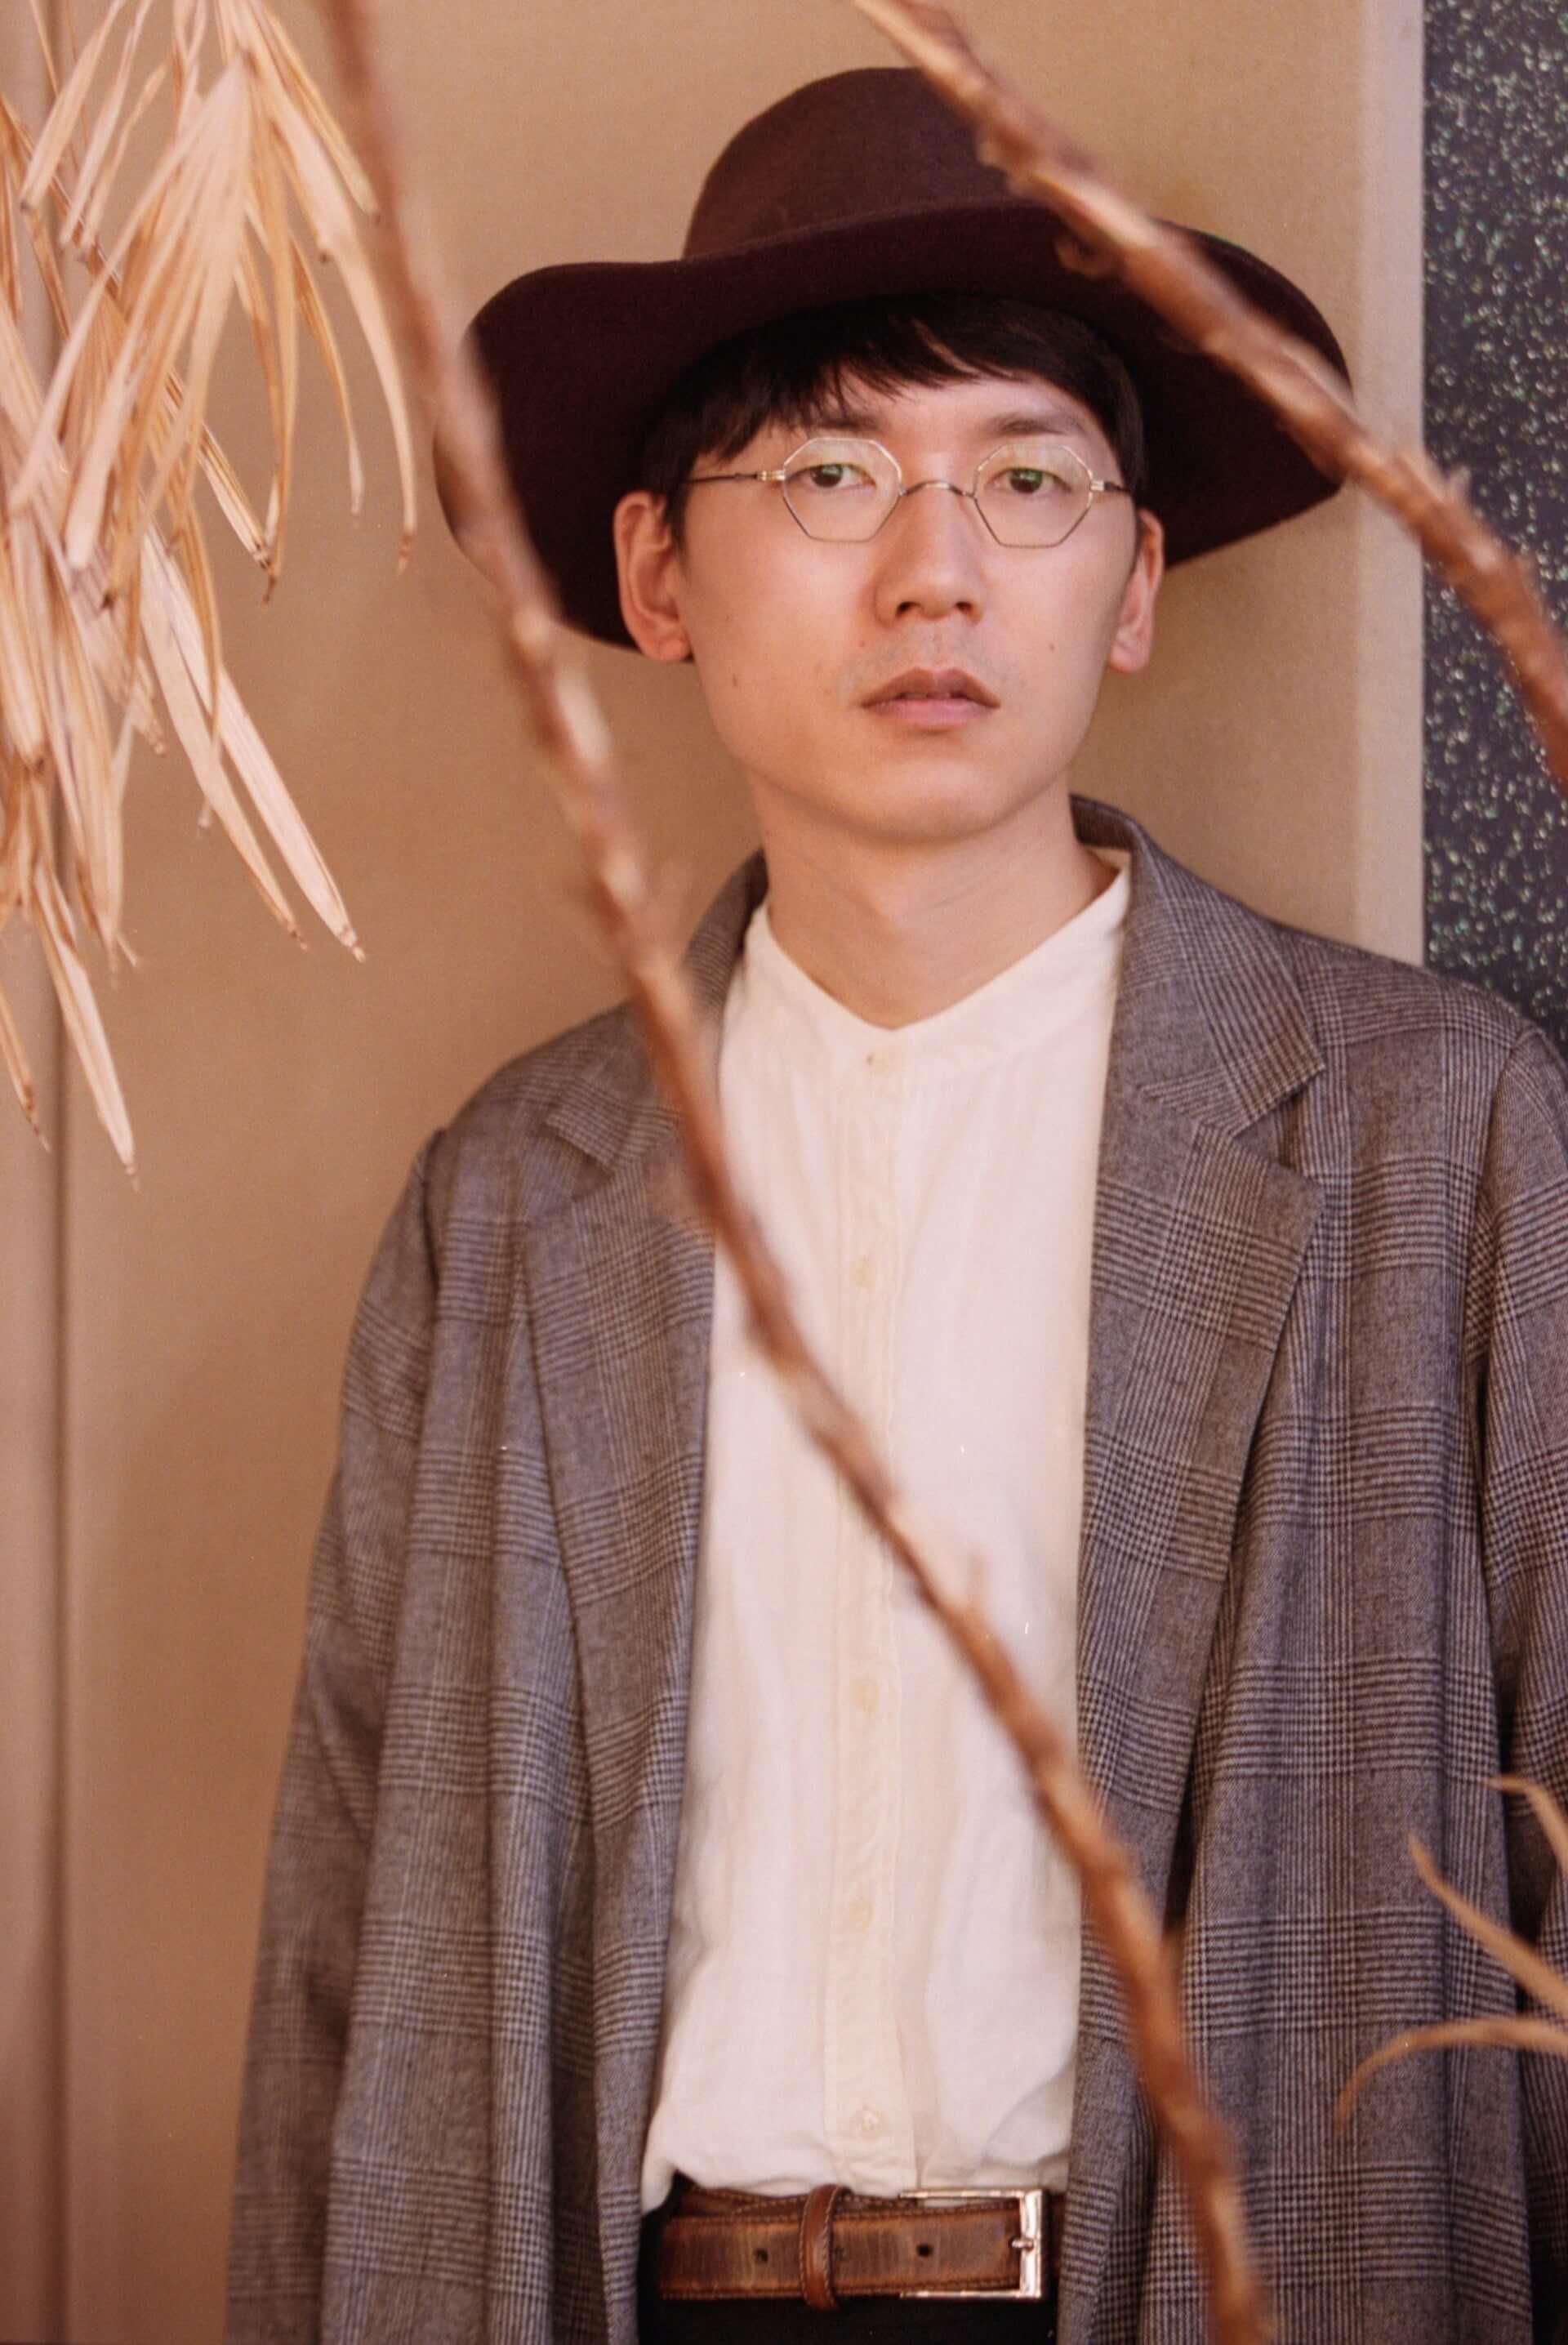 Kan SanoをフィーチャーしたShin Sakiuraの先行シングル「ほんとは feat. Kan Sano」が本日配信開始 music200311_shinsakiura_2-1920x2871